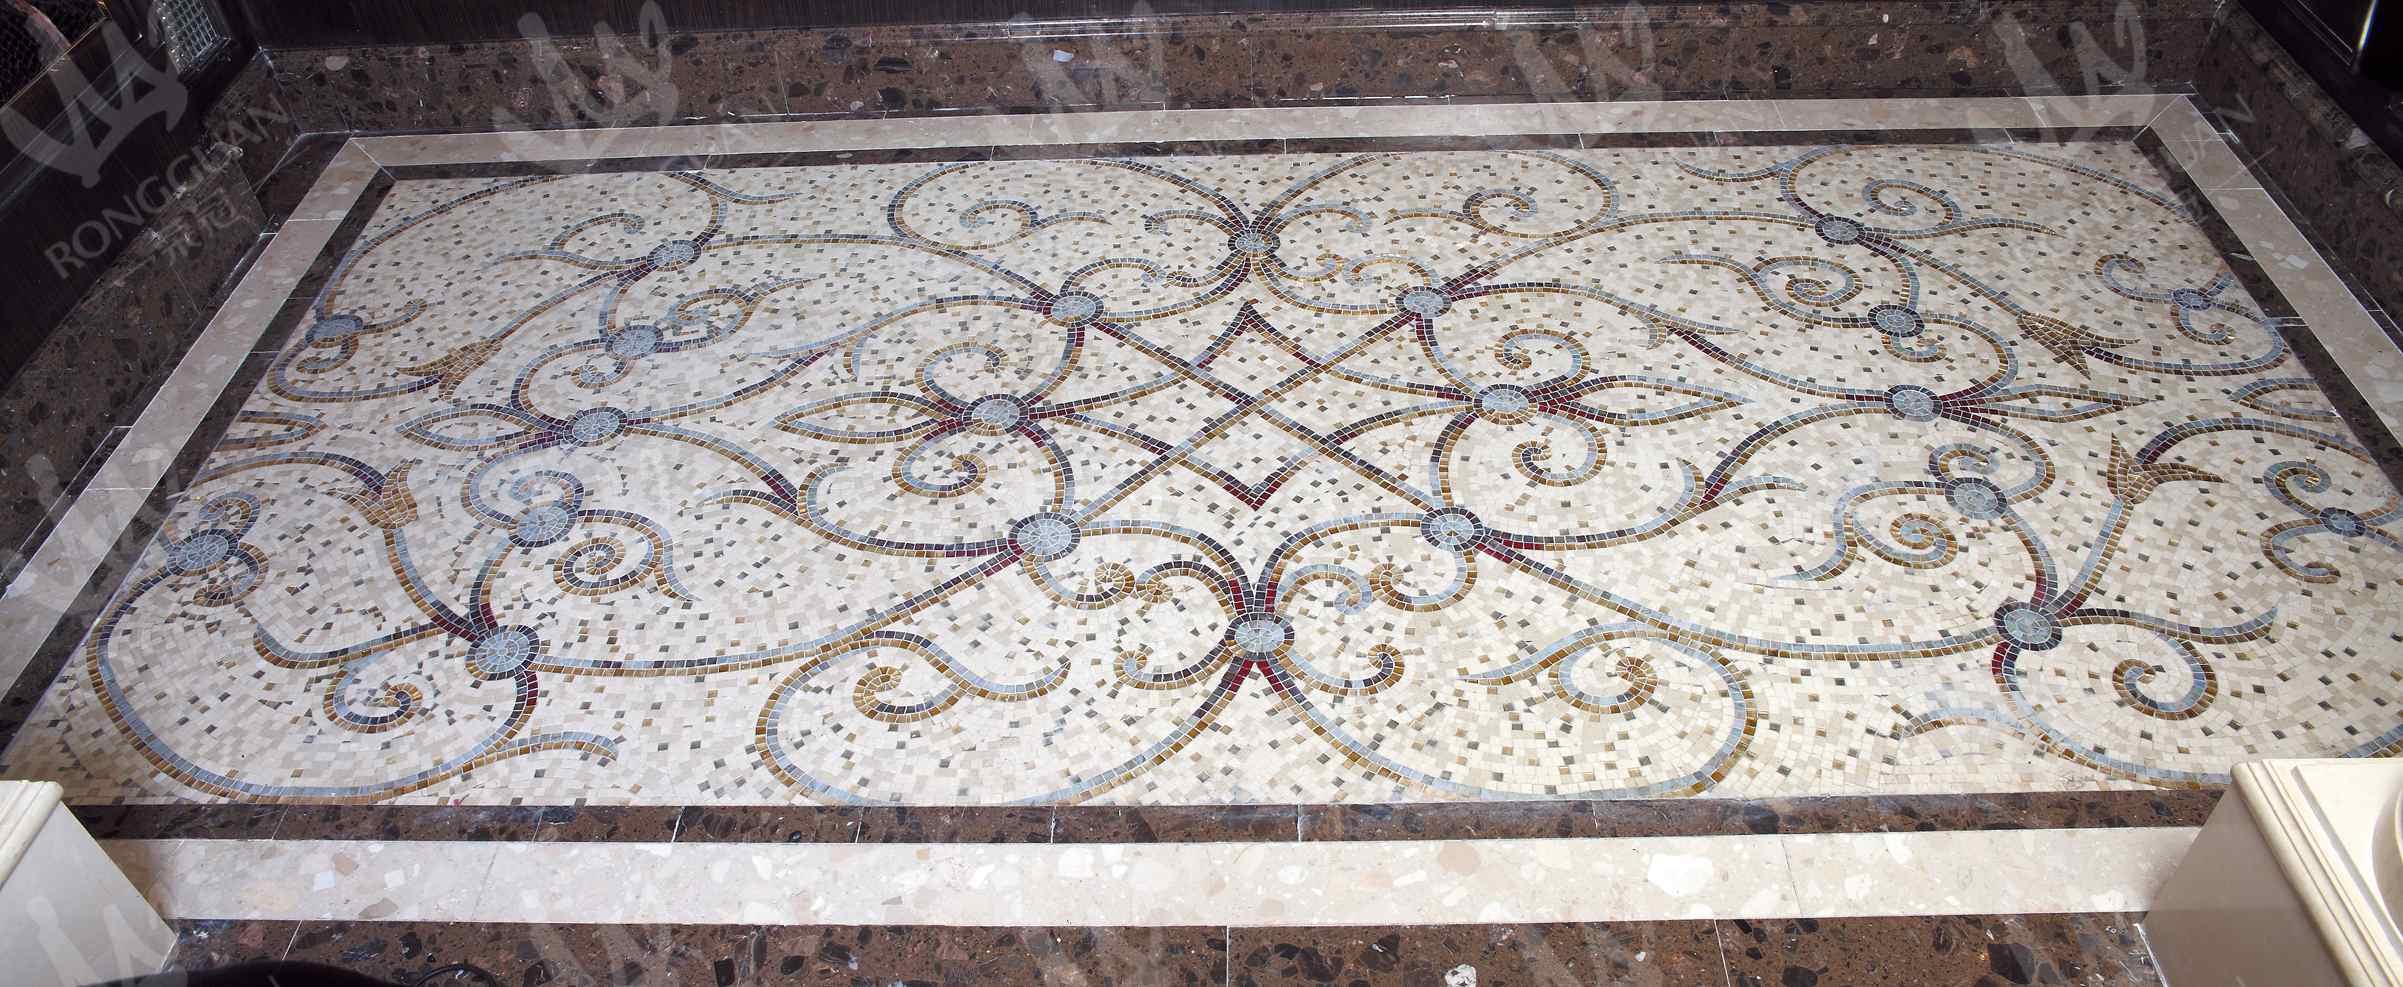 China Marble Stone Mosaic Art Design For Floor Carpet